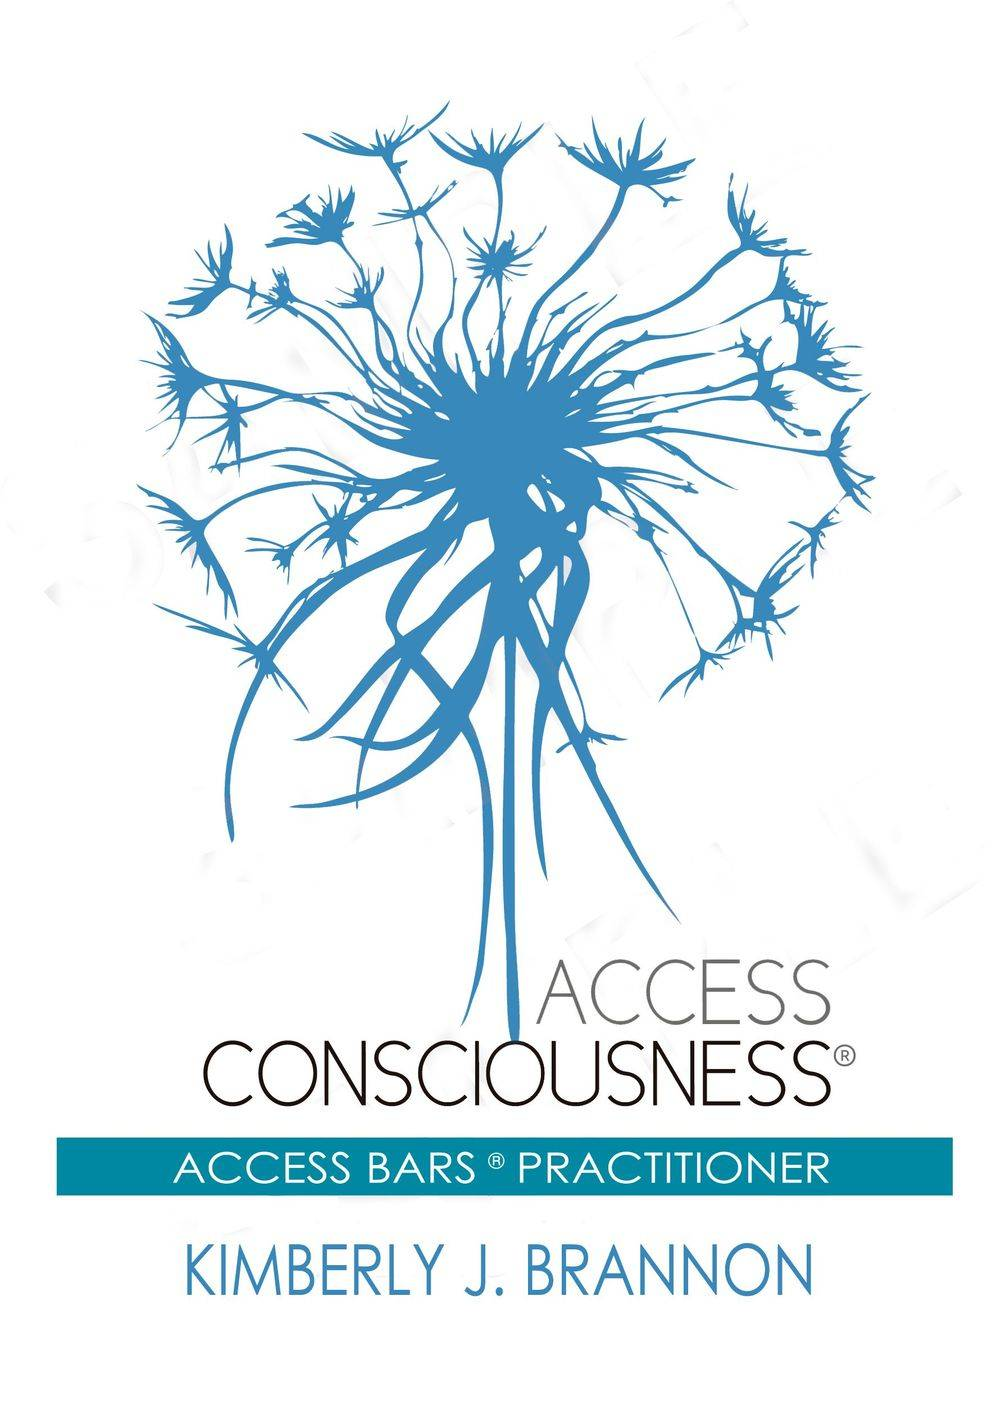 Kimberly J. Brannon Moonhand Healing Access Consciousness Bars